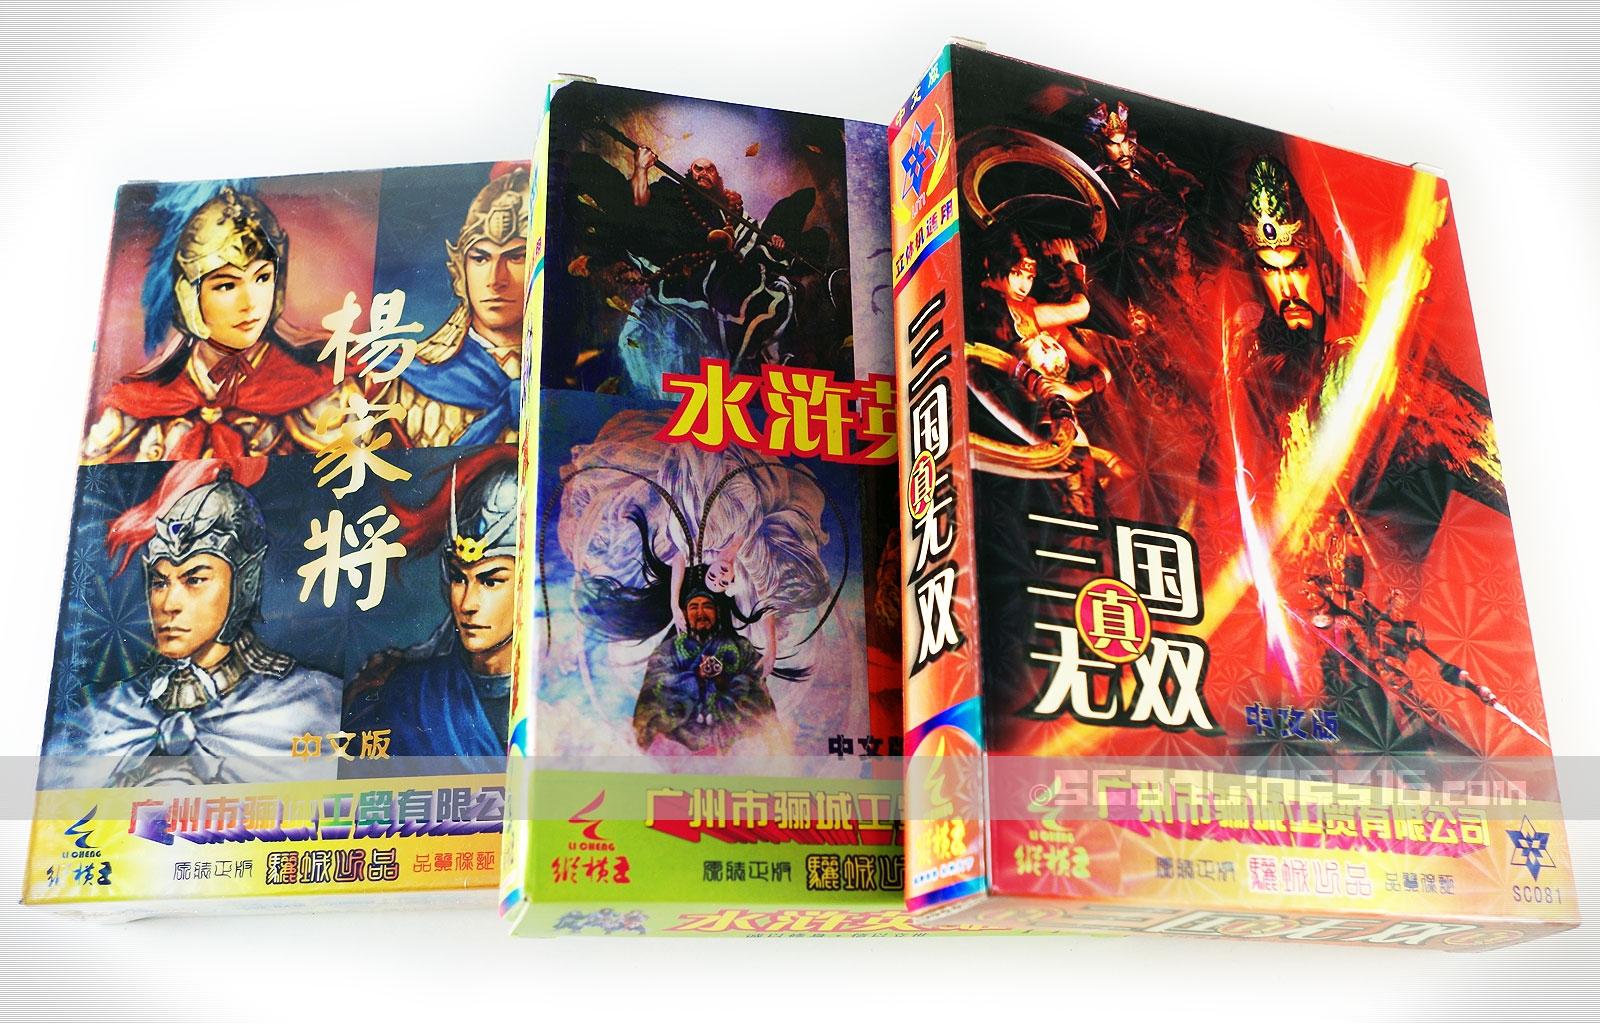 3 Beat'em All développés dans les années 90 à Taiwan, sans license SEGA. De gauche à droite : Yang Warrior Family, Shuǐ Hu Feng Yun Zhuan, Warrior of Fate / Tenchi O Kurau.